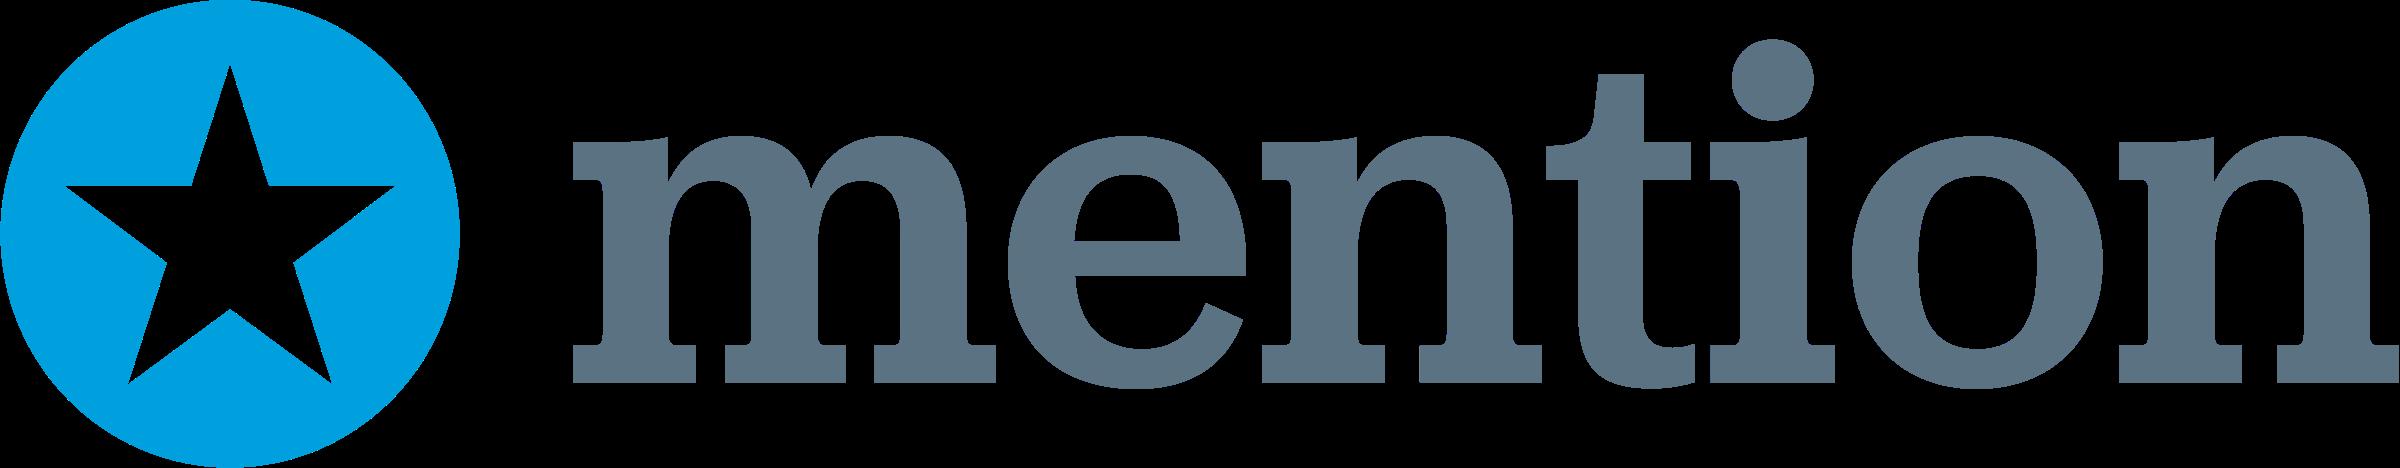 mention-logo-png-transparent